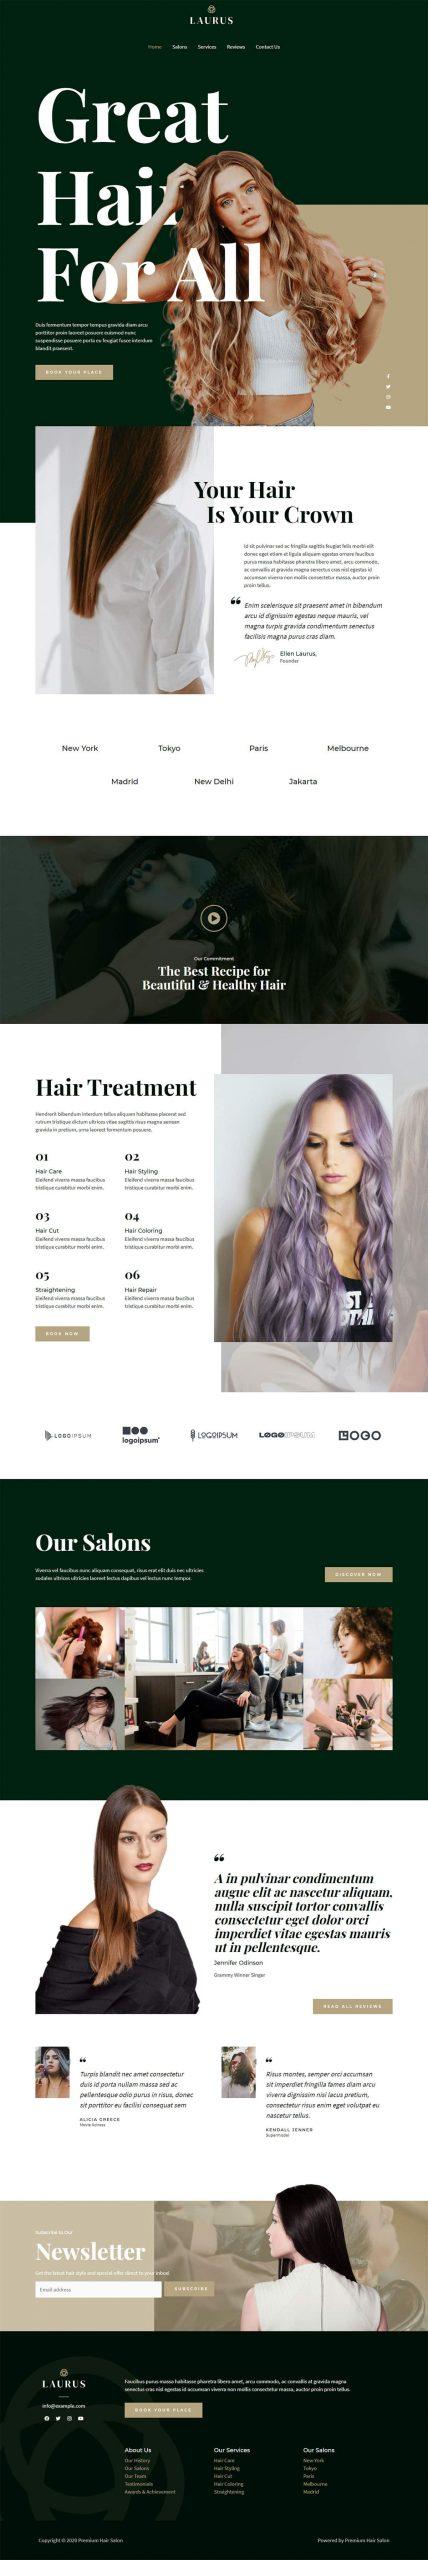 Adamo Web Design | Web Design Durham | hair salon 04 home scaled